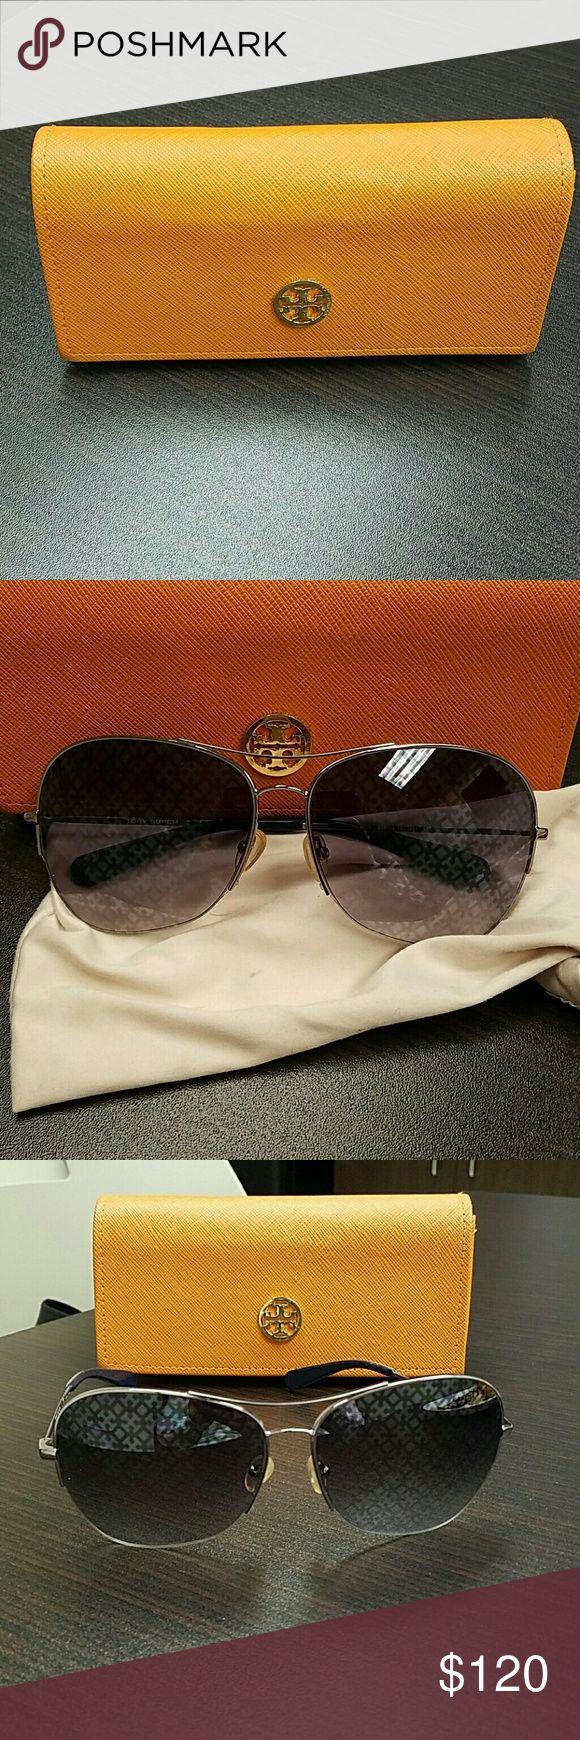 Tory Burch women's aviator sunglasses Silver women's aviator sunglasses. Tory Burch Accessories Sunglasses